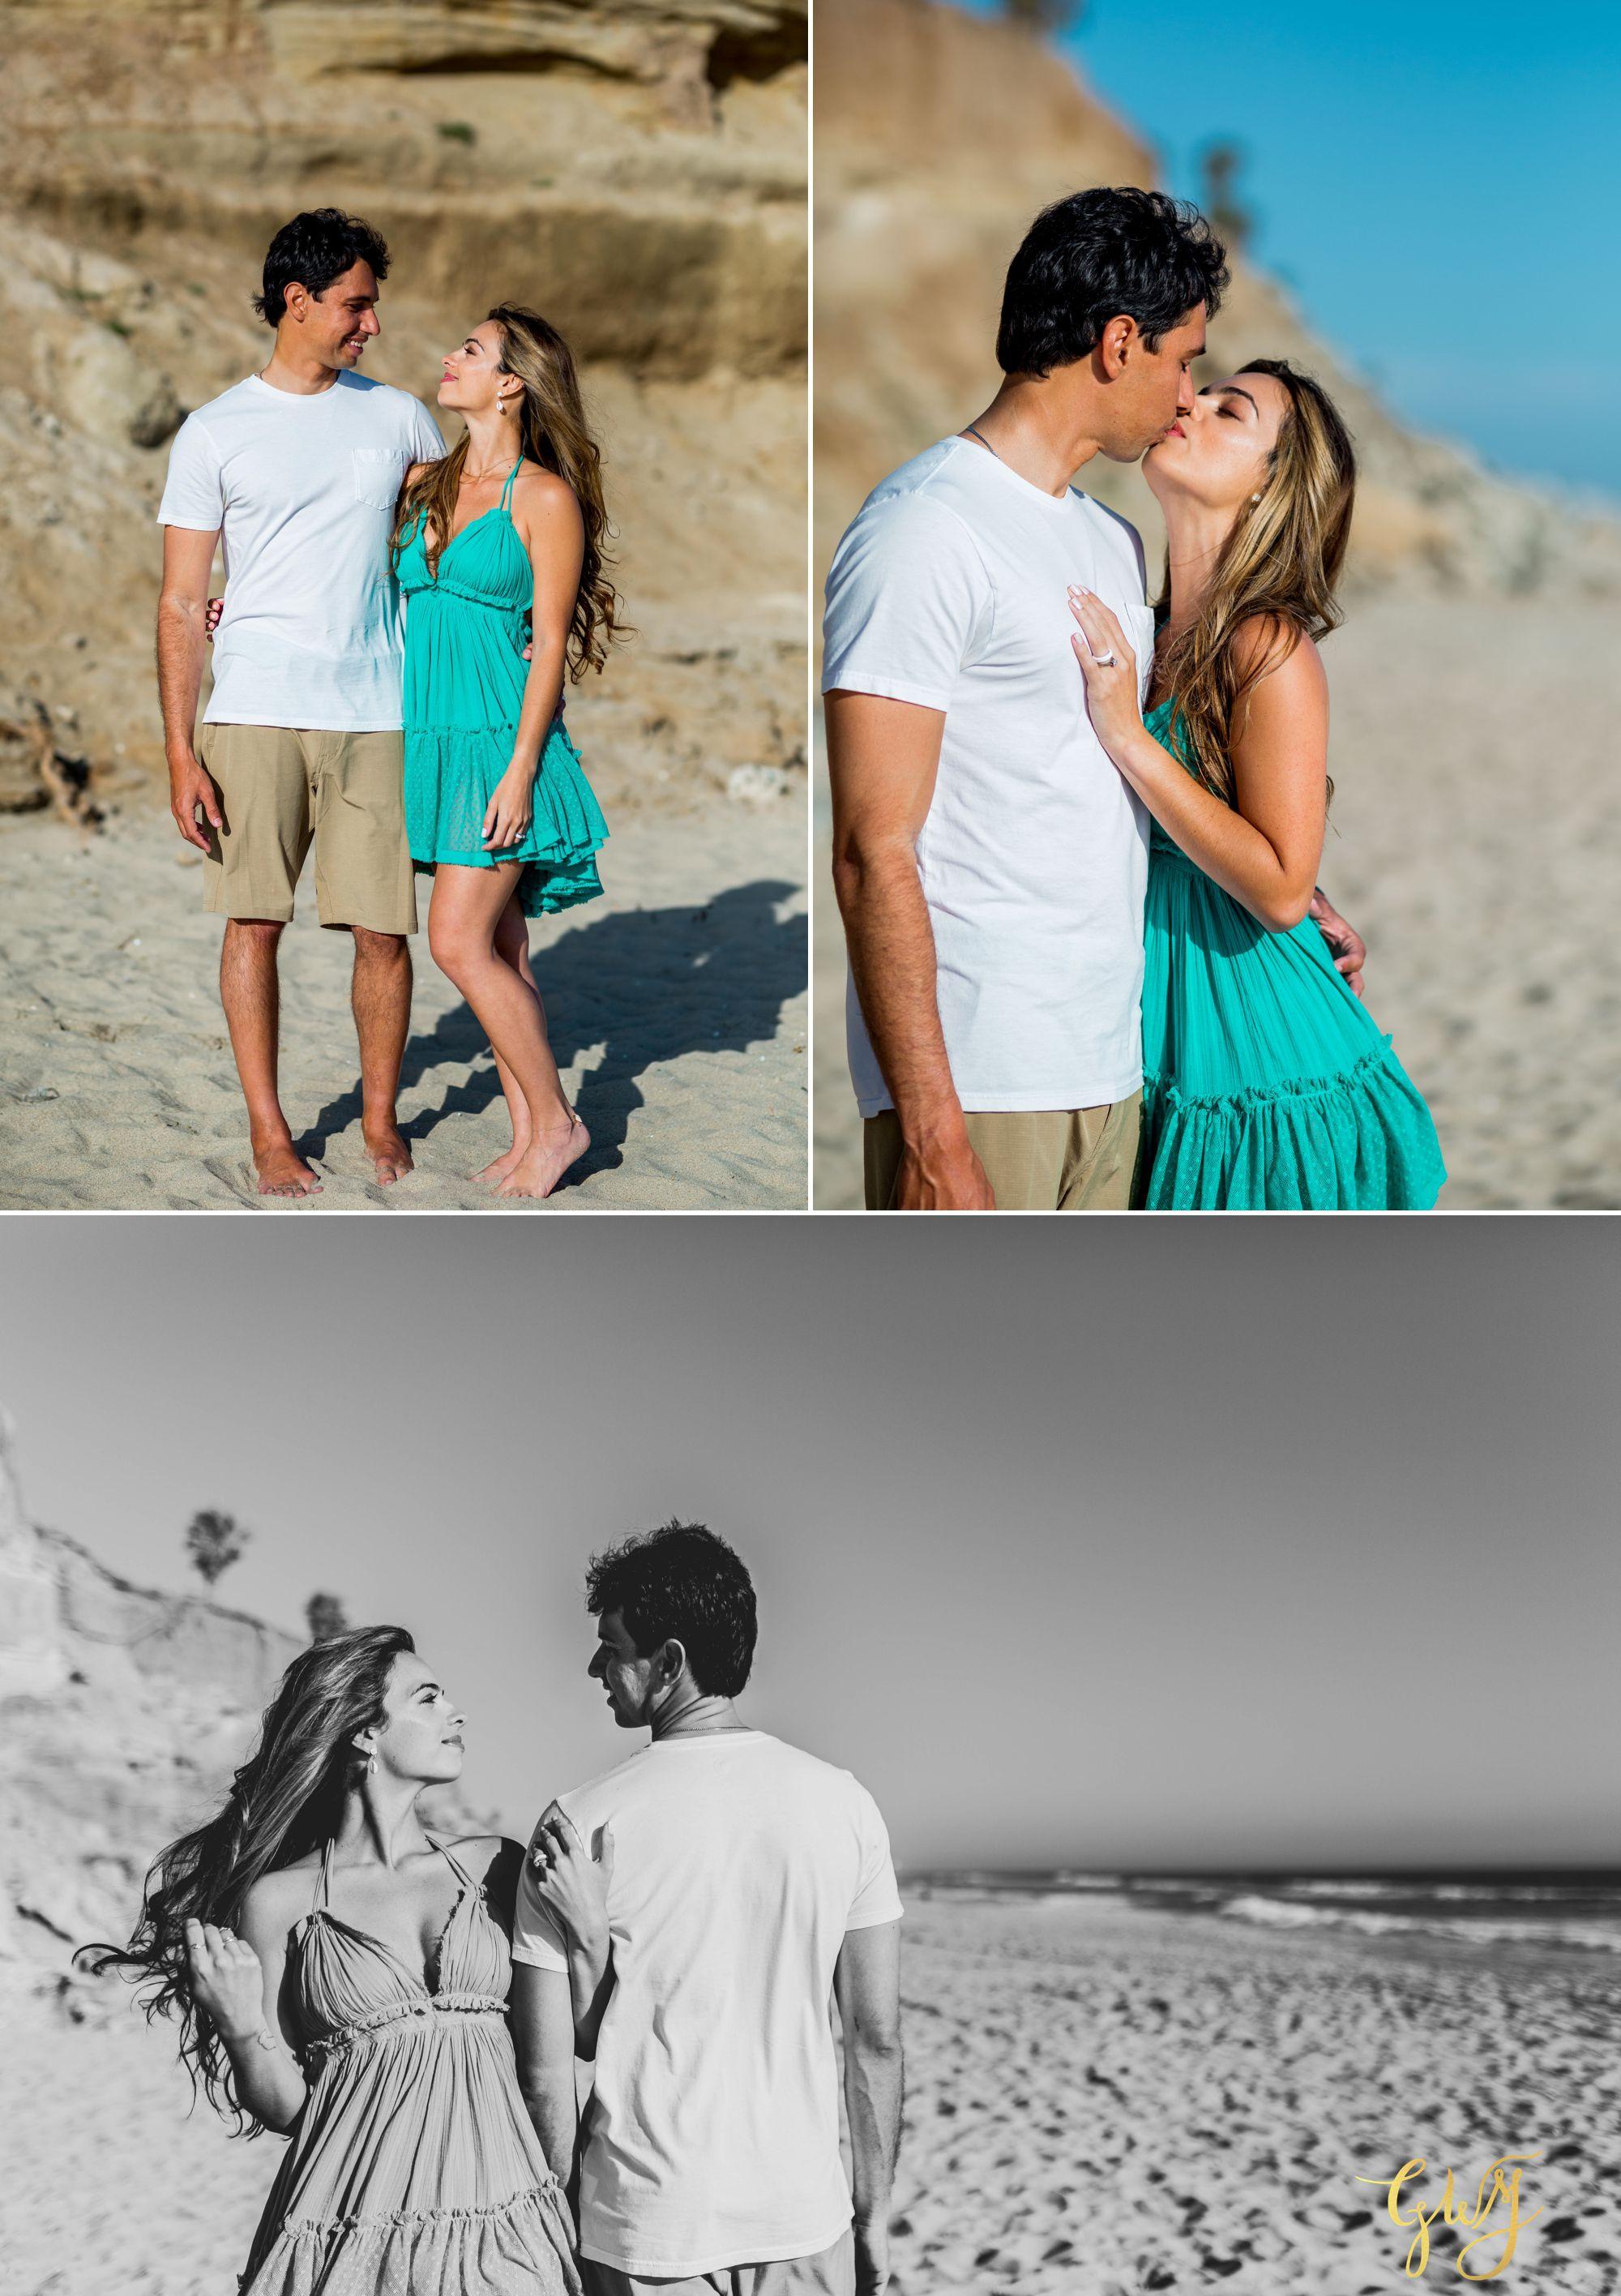 Felipe + Isabella Huntington Beach Summer Sunset Engagement Session by Glass Woods Media 2.jpg